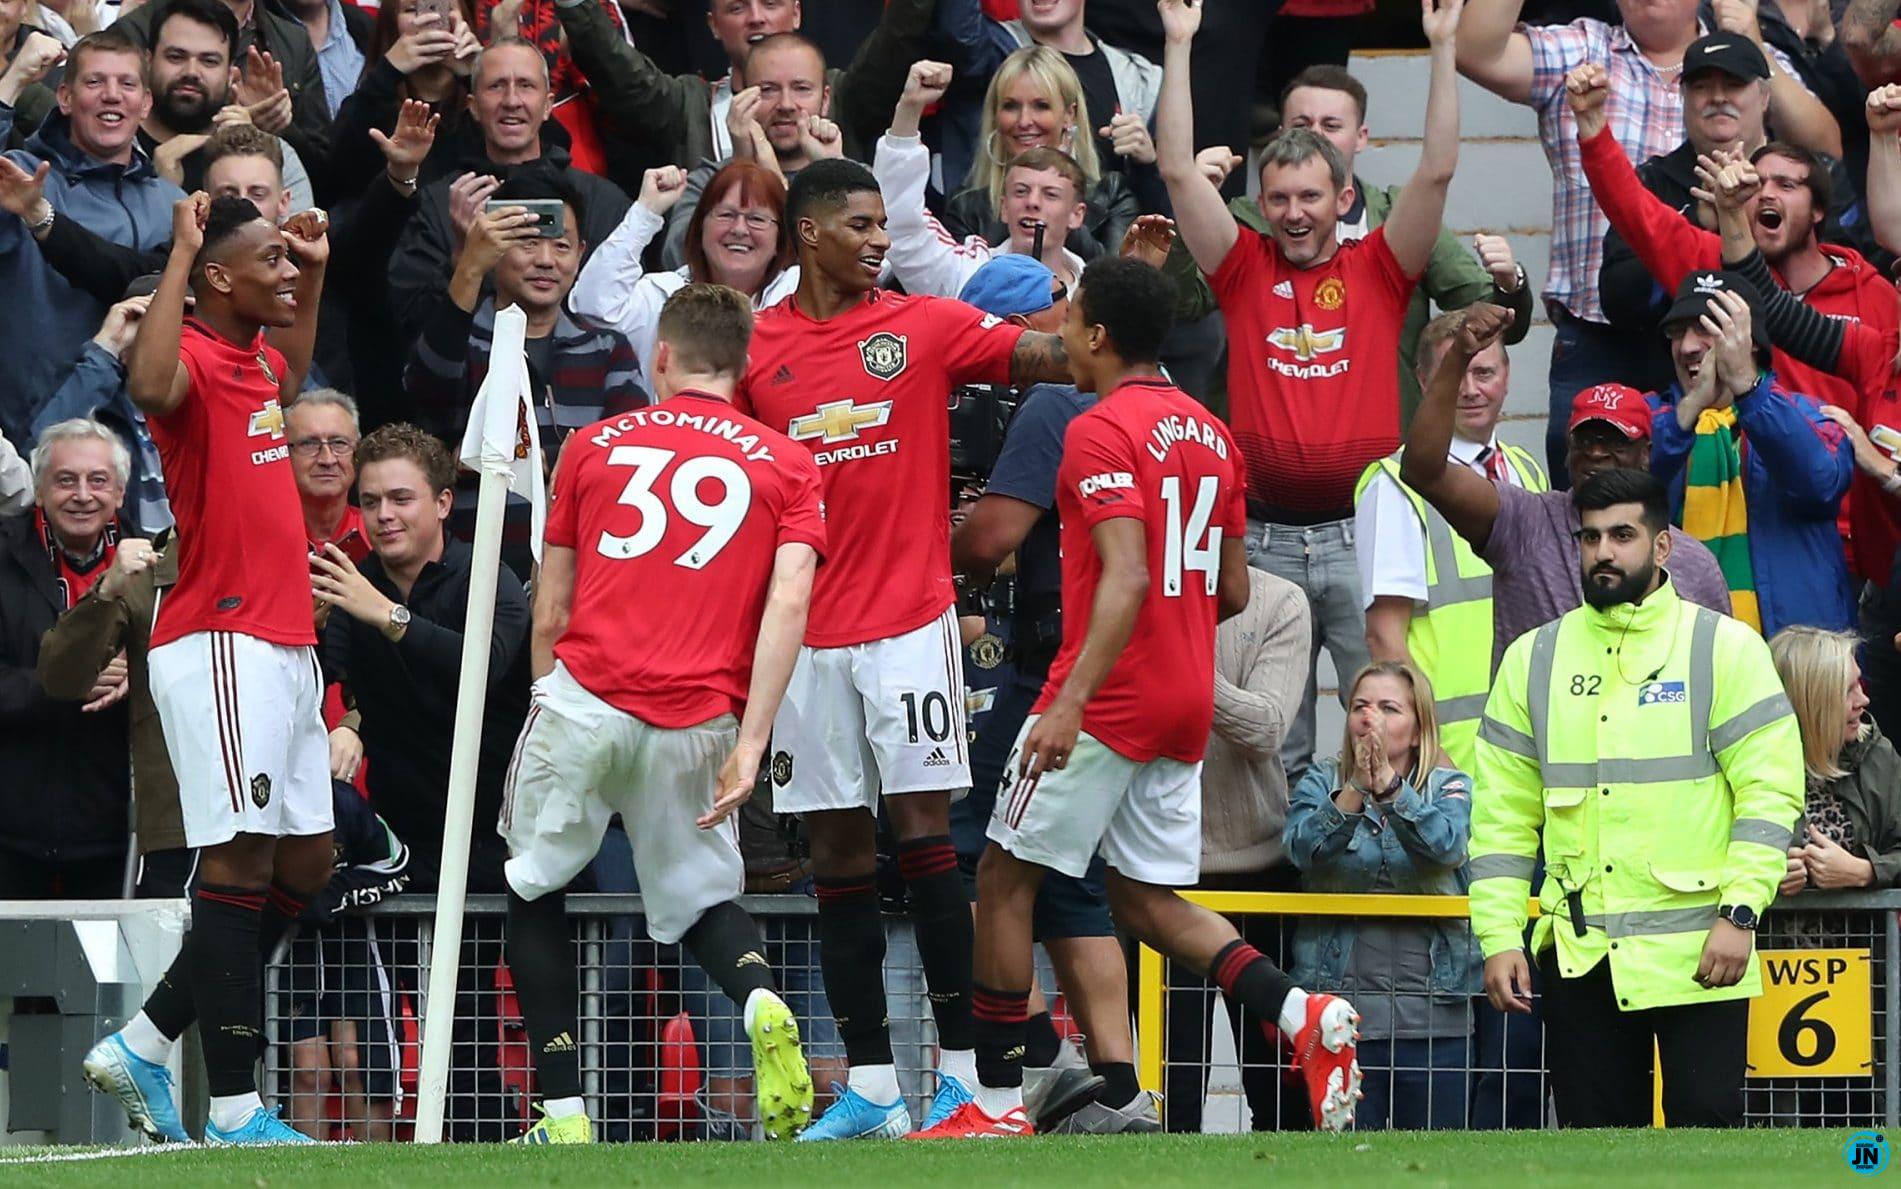 EPL VIDEO: Manchester United vs Chelsea 4-0 Highlights & Goals 11/08 ...